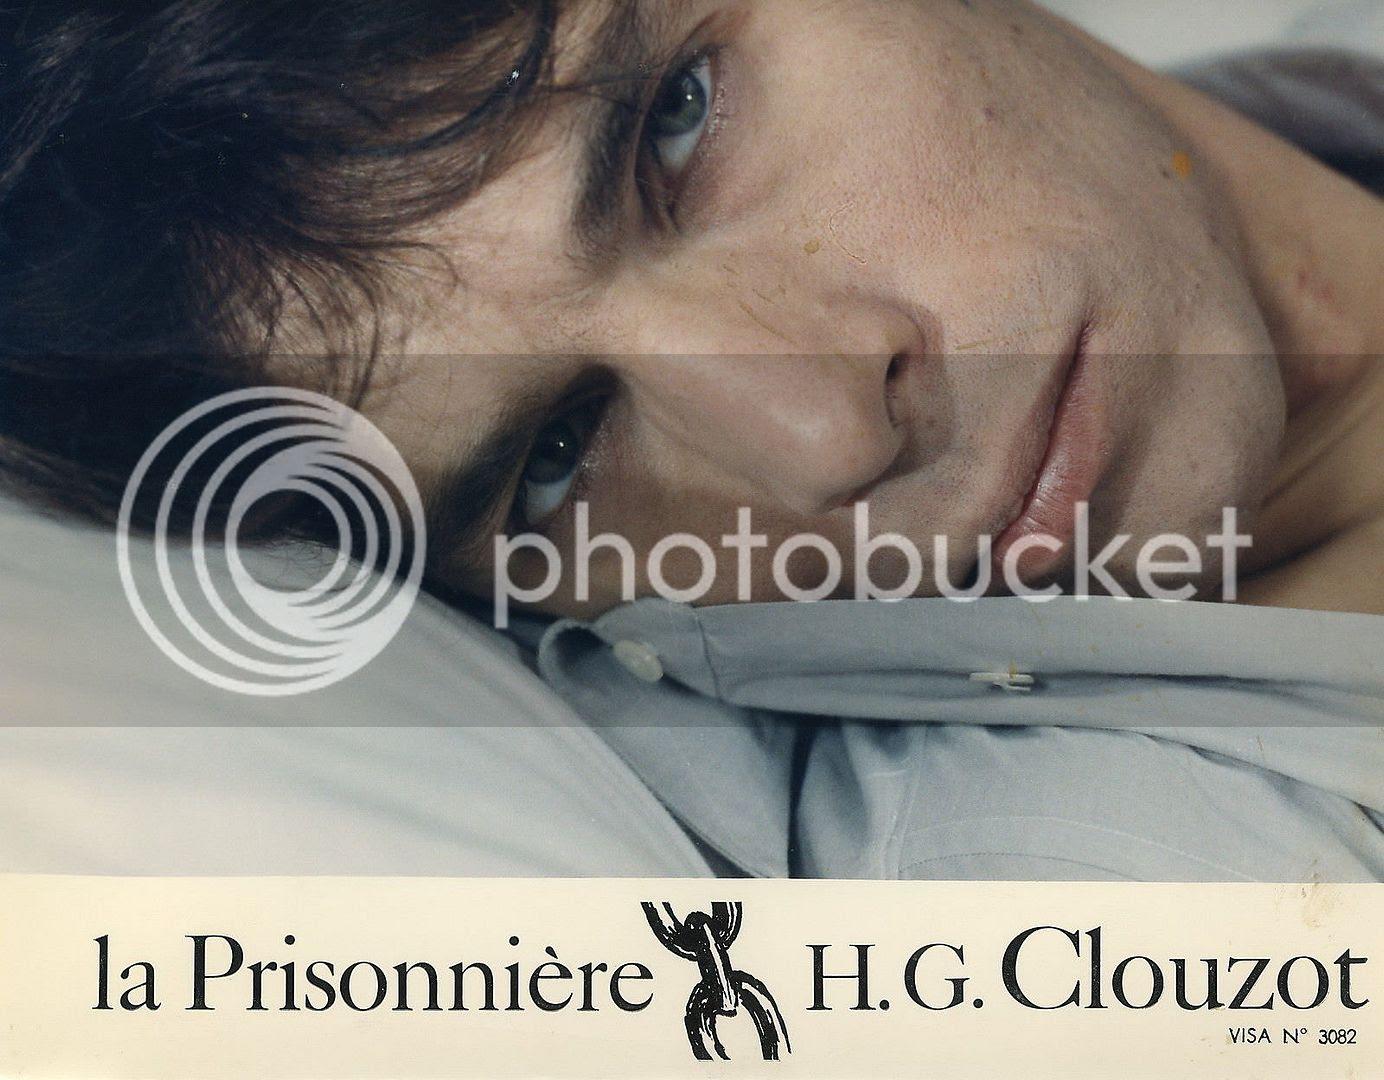 photo poster_prisonniere-1.jpg